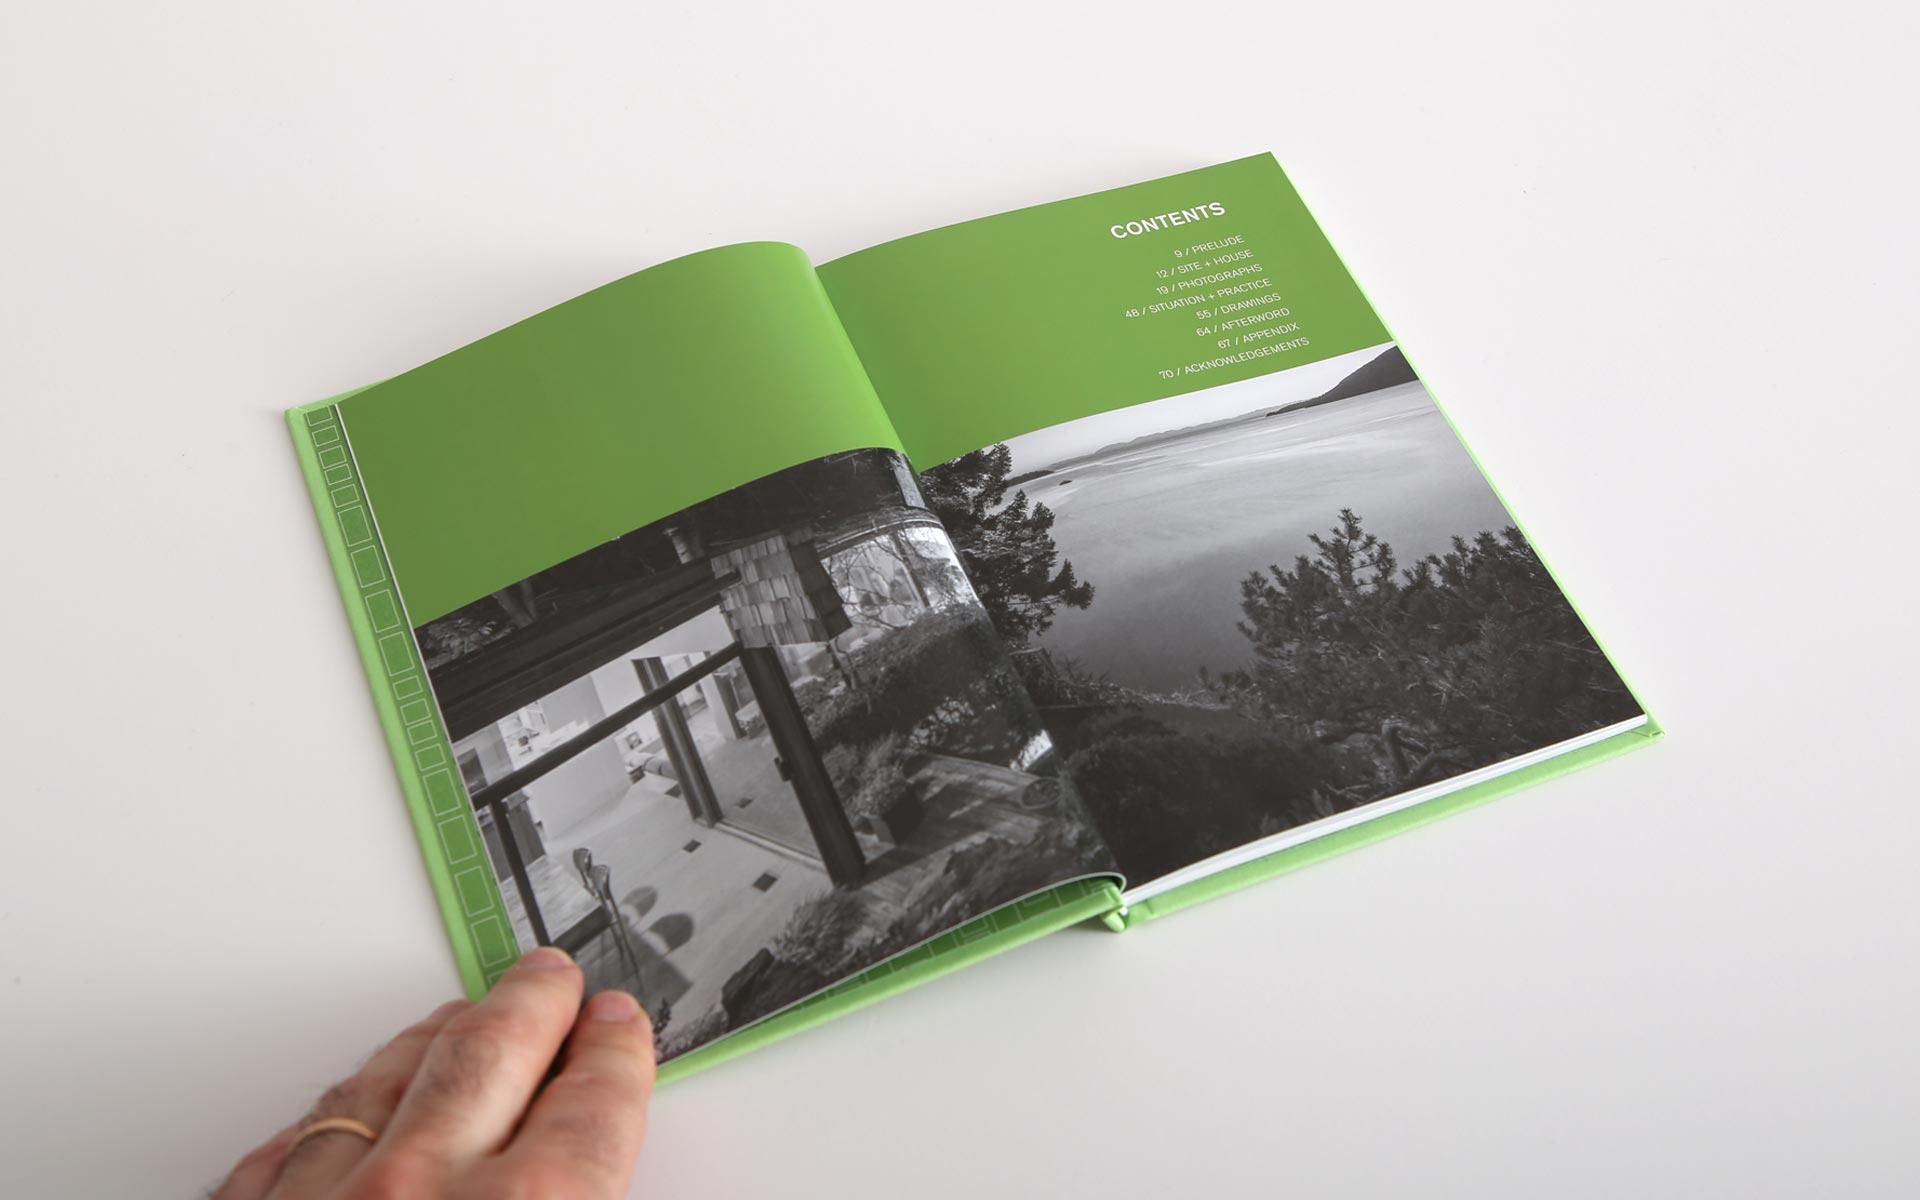 ubc-sala-book-design-15